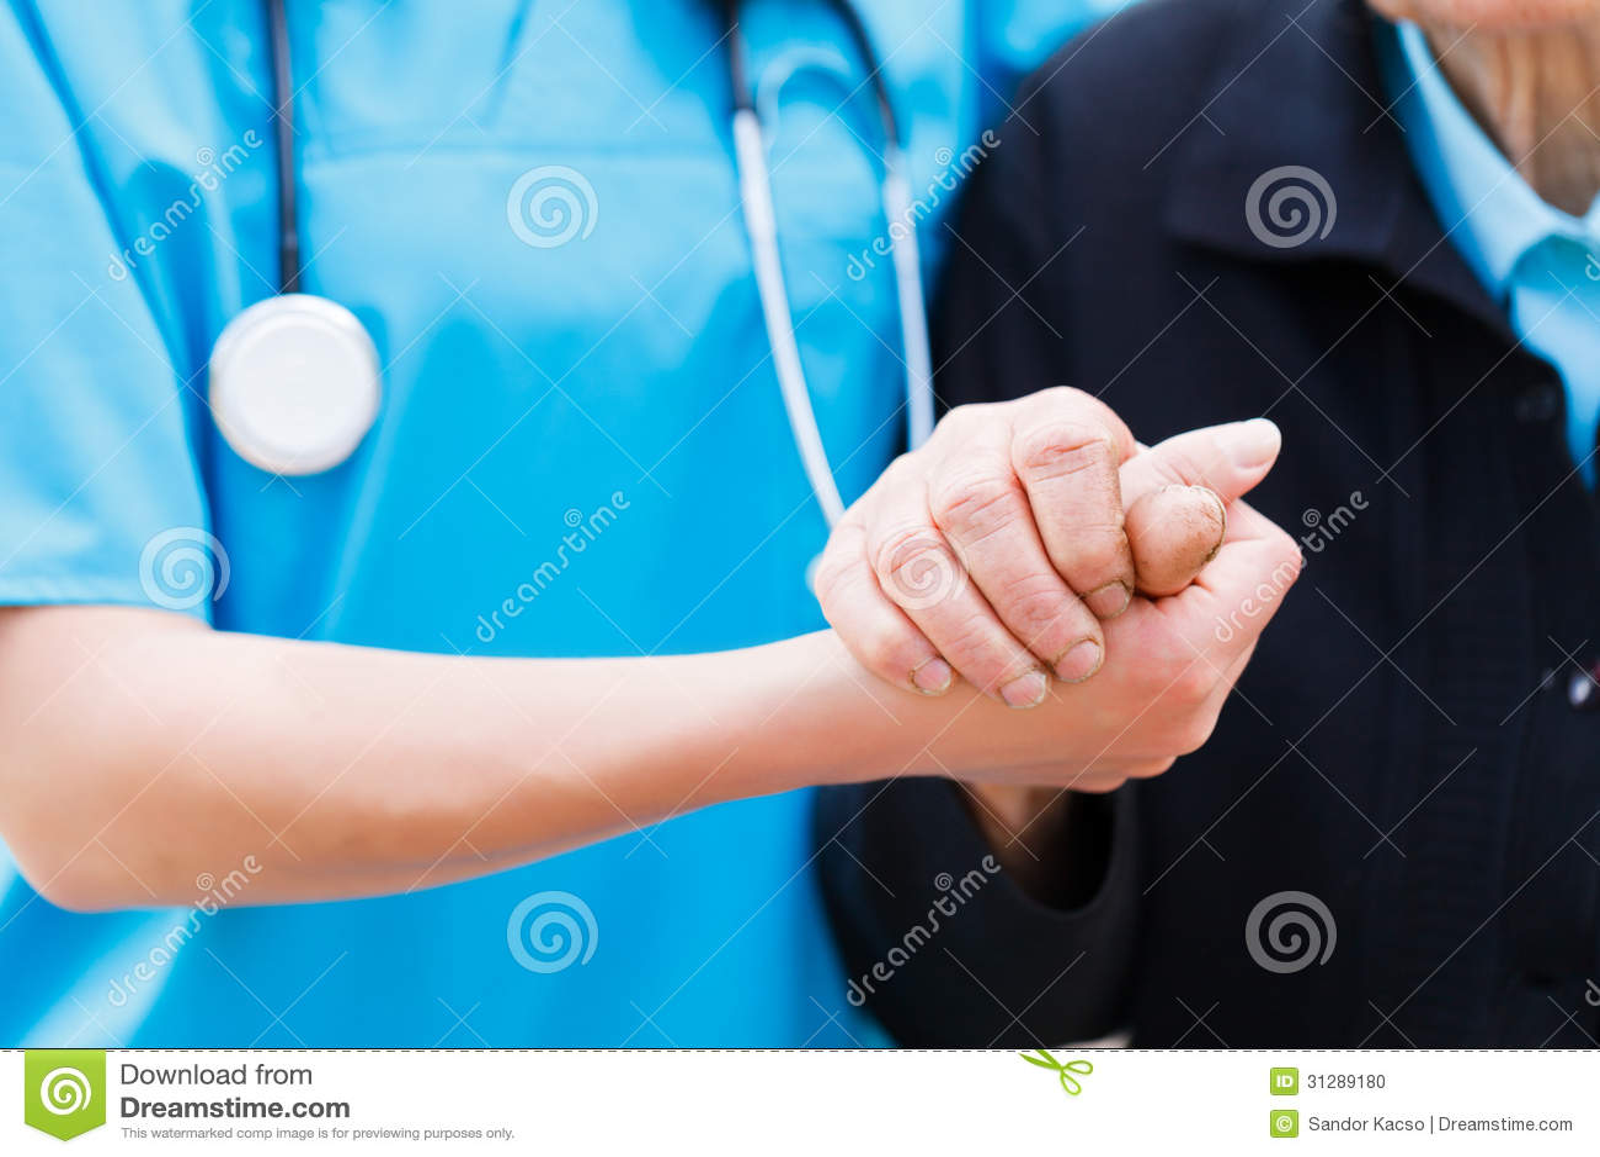 Caring Nurse holding Elderly Hands